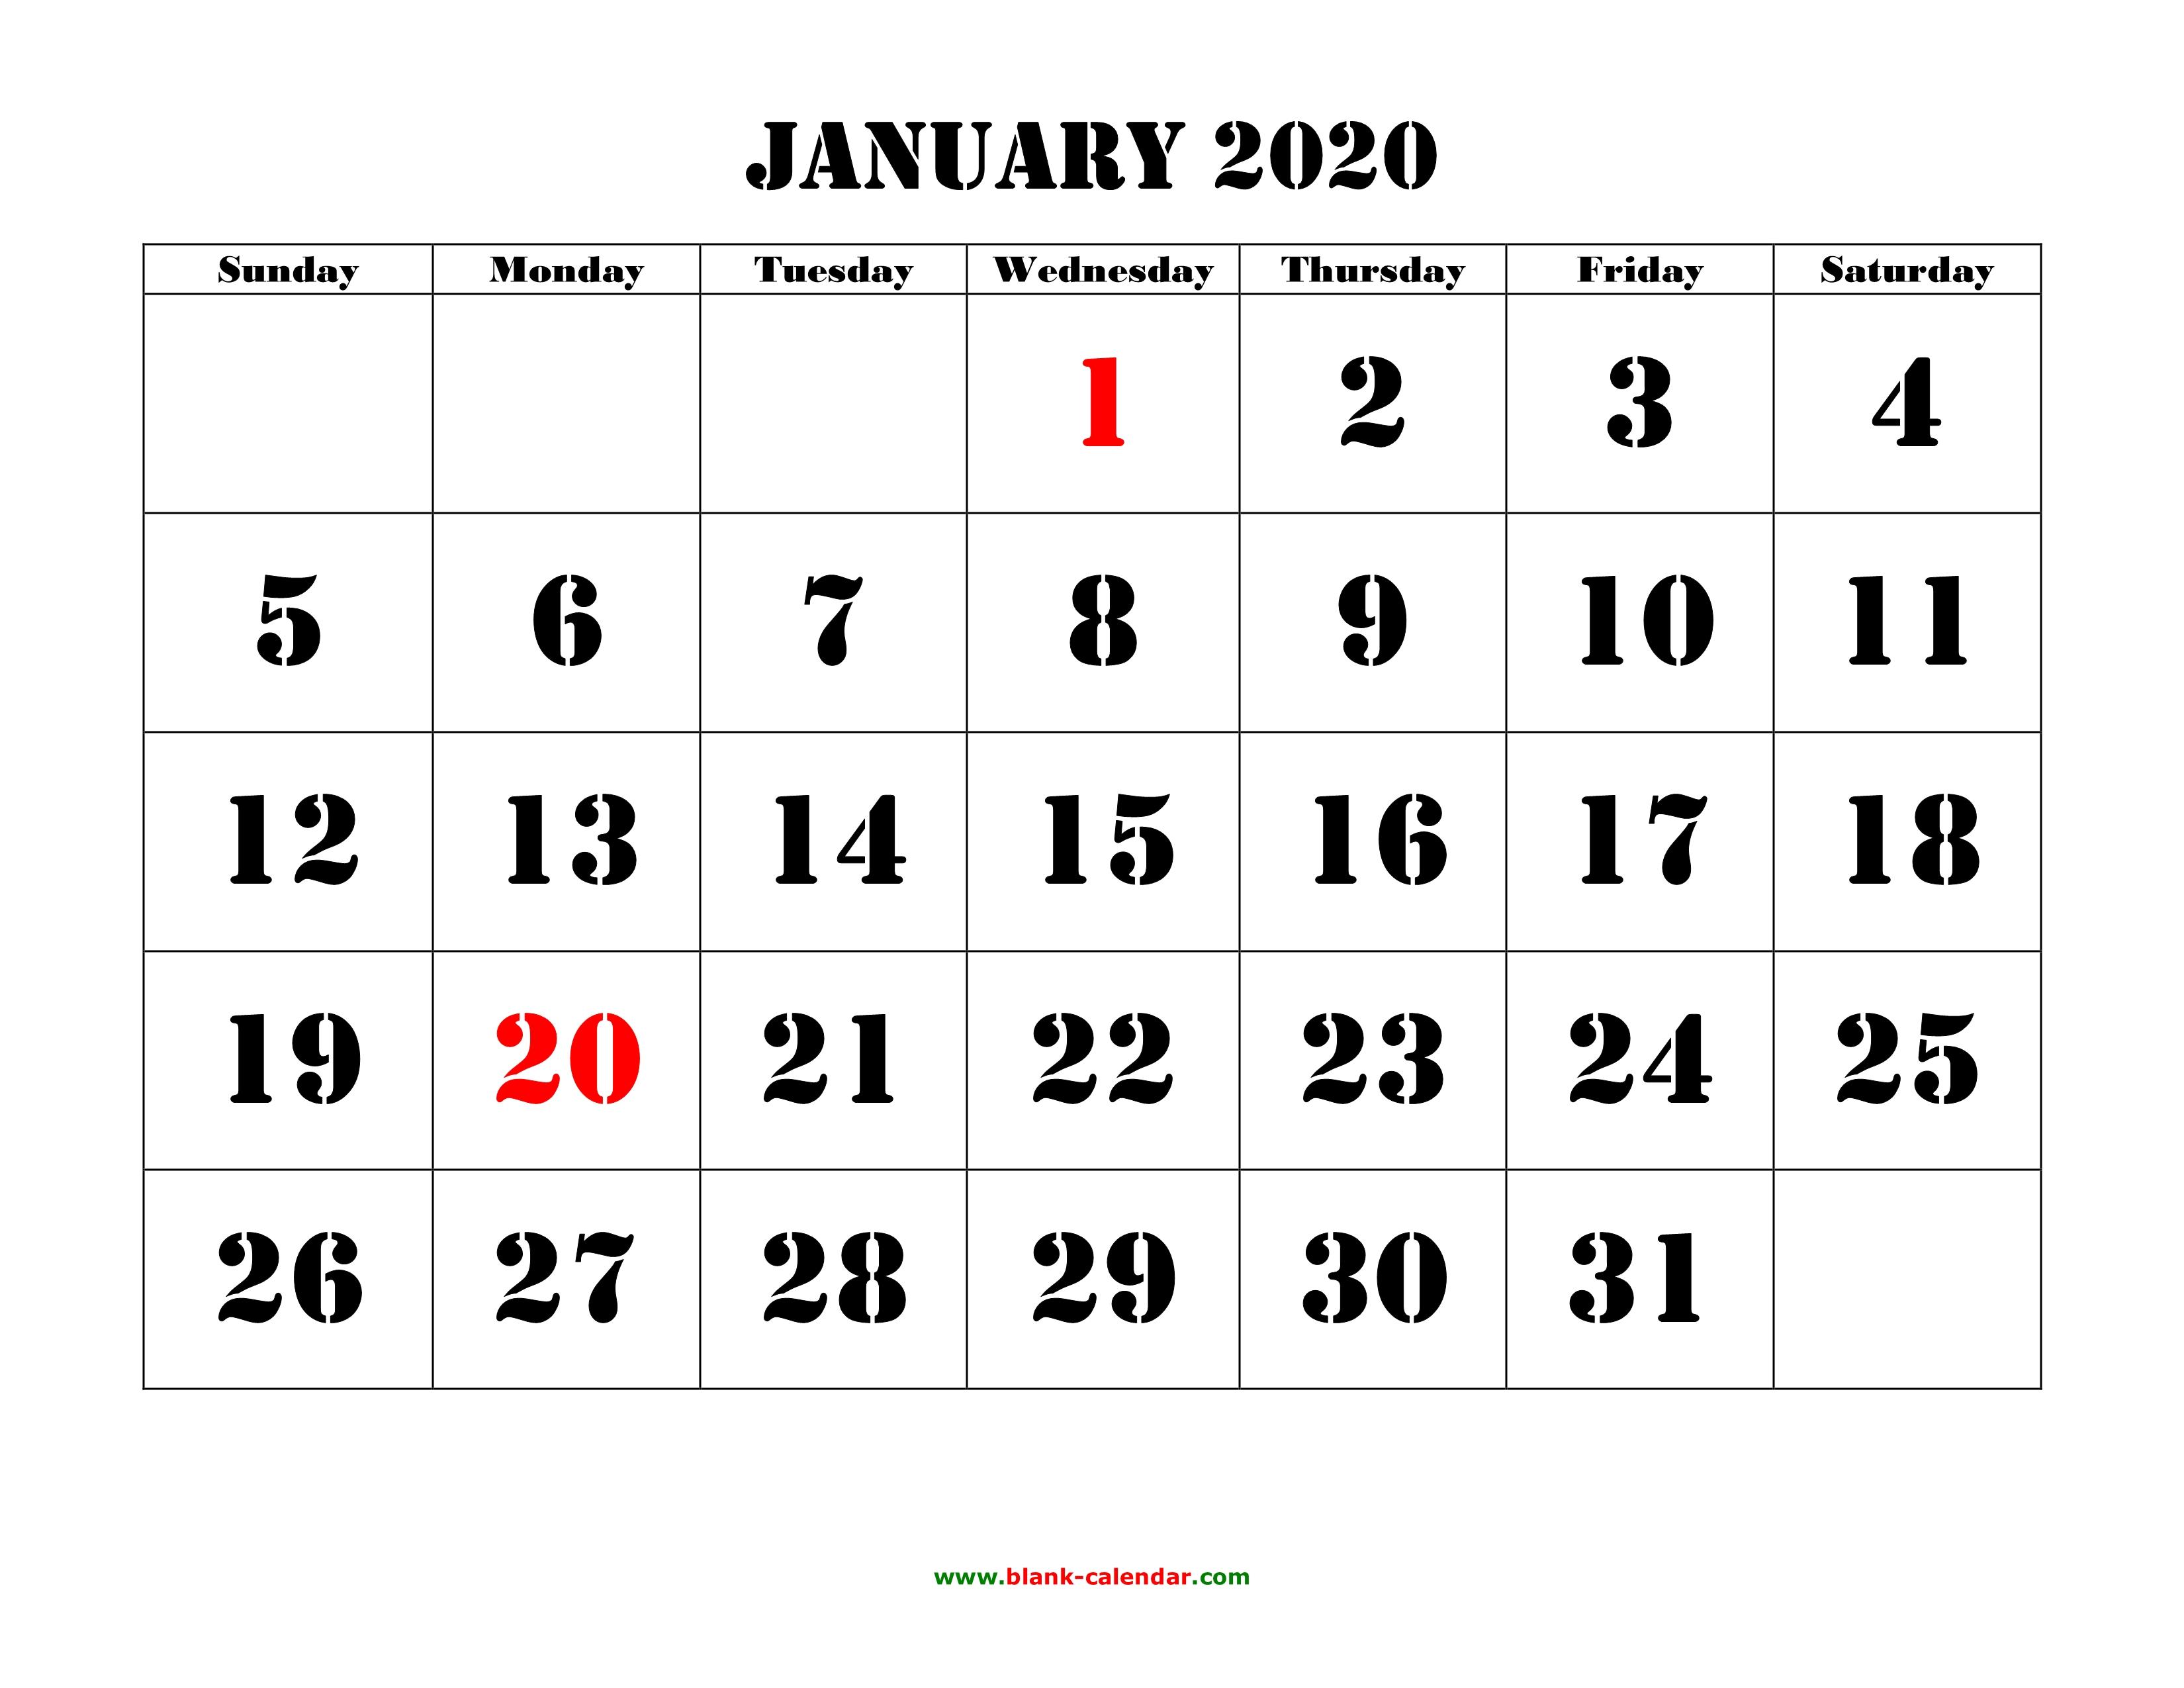 January 2020 Calendar Word